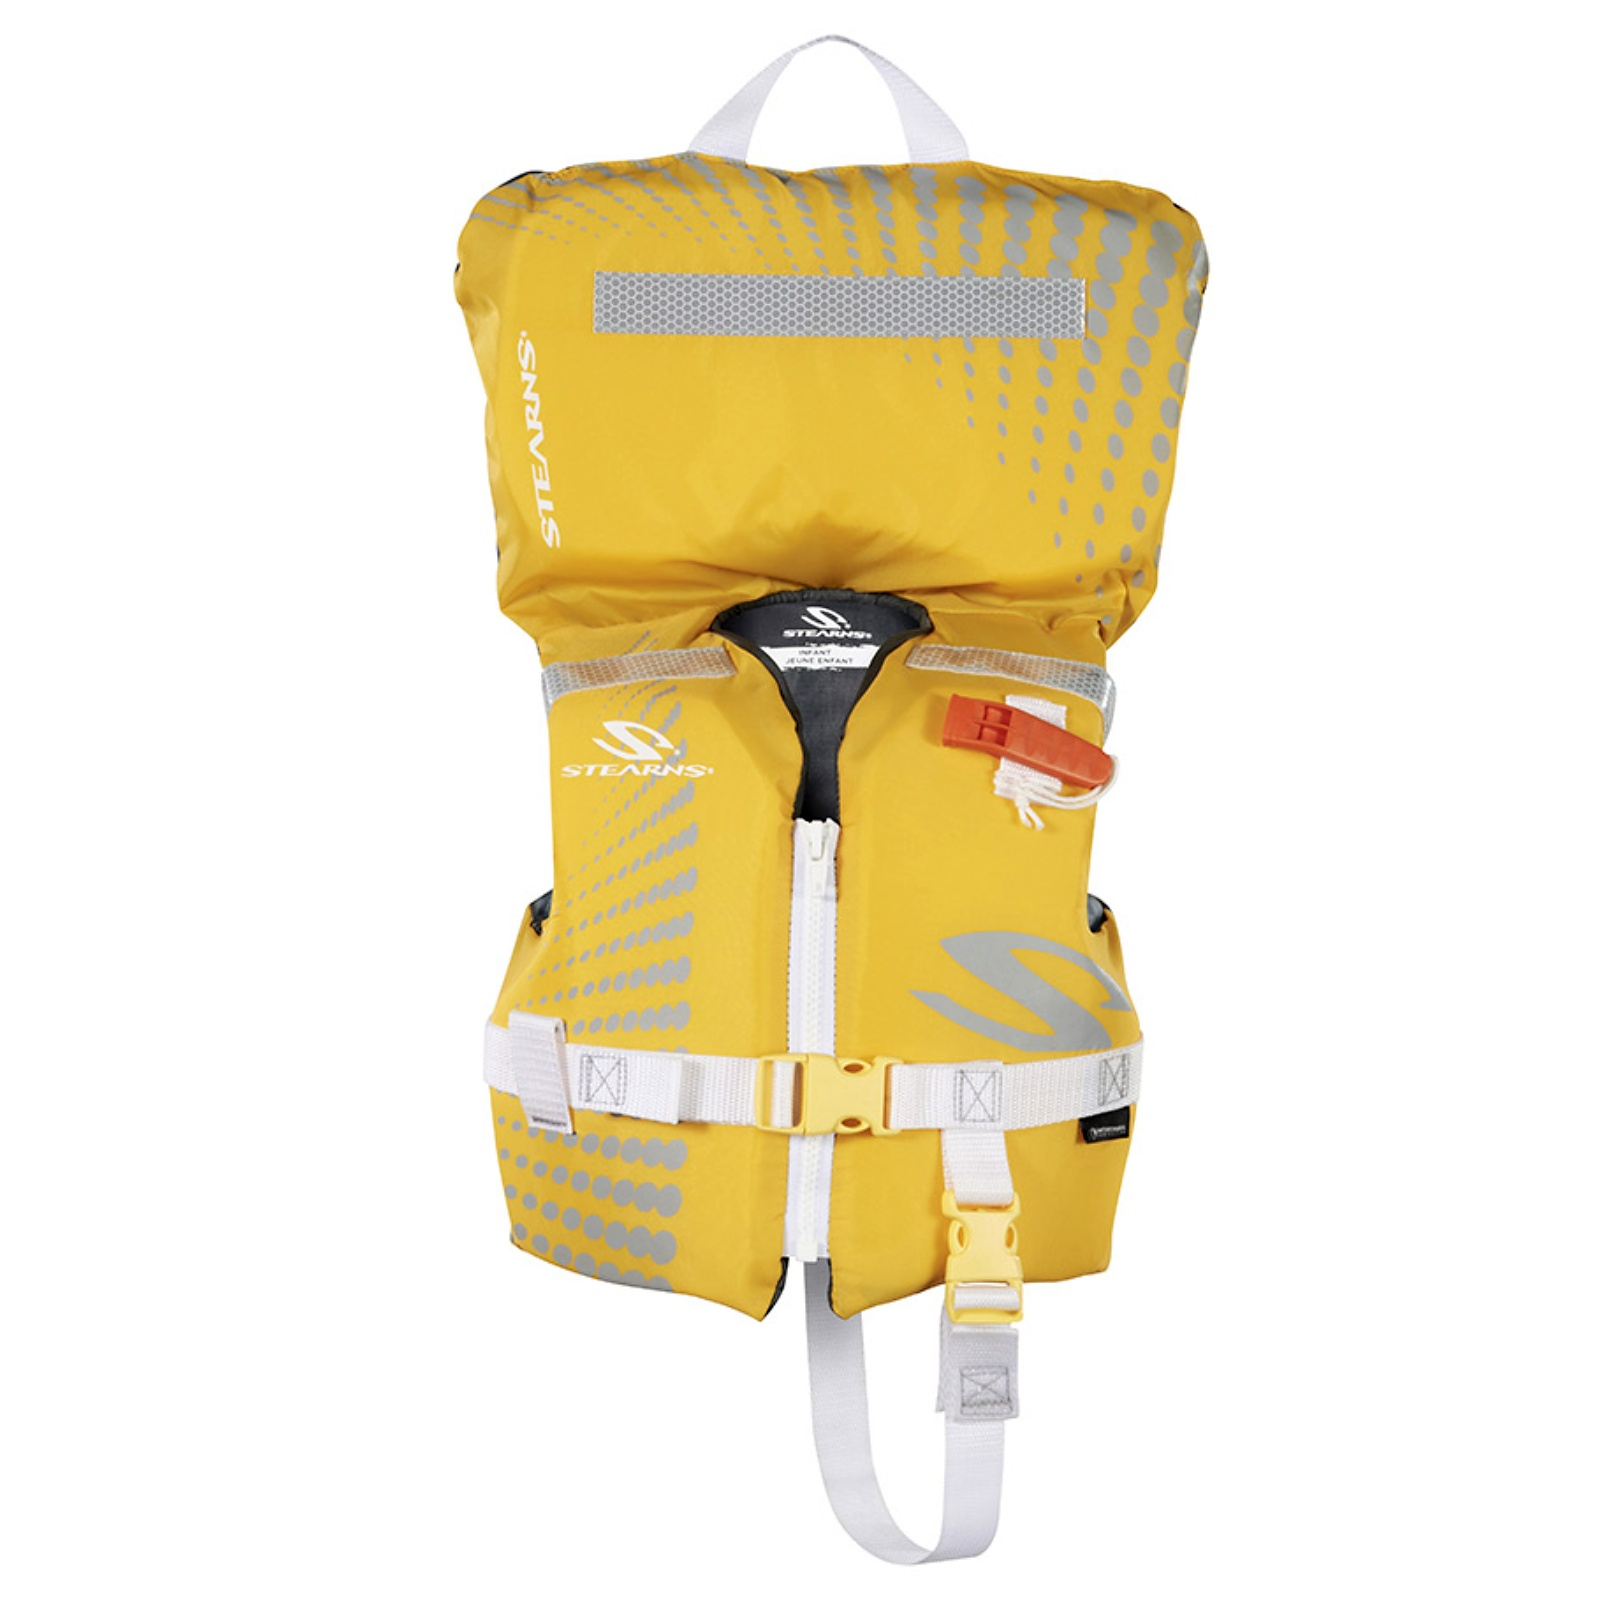 Plovací vesta STEARNS Anti-Microbial Infant